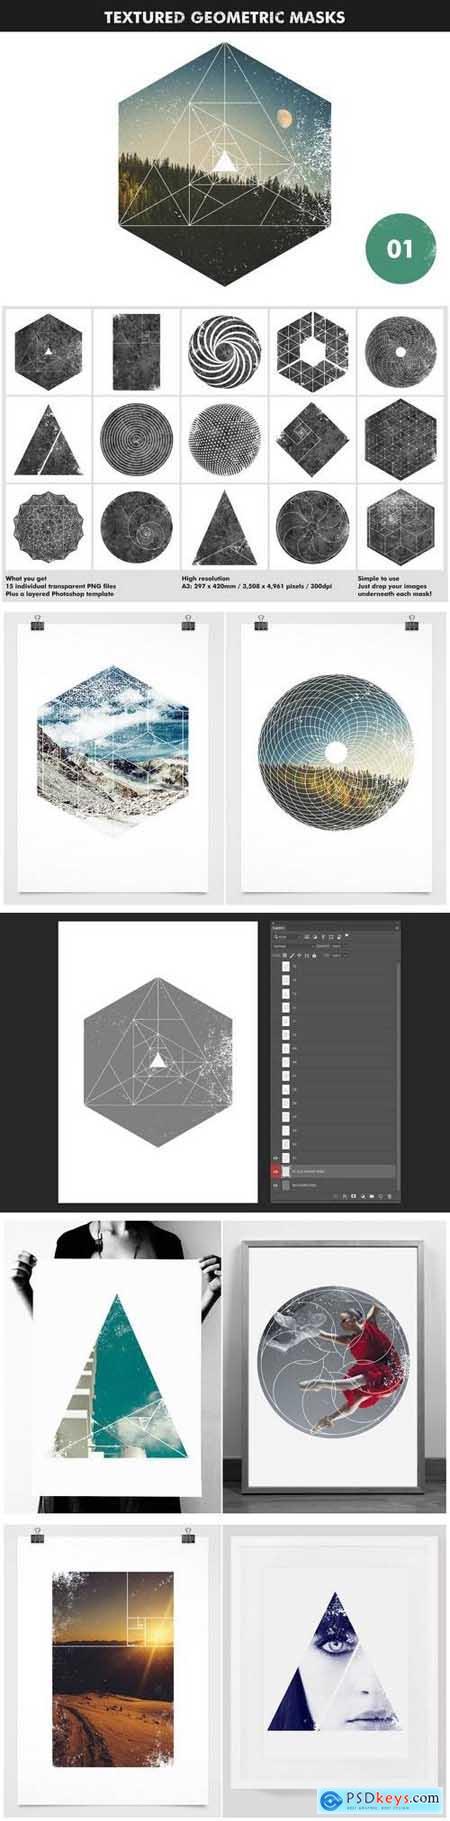 Textured Geometric Masks